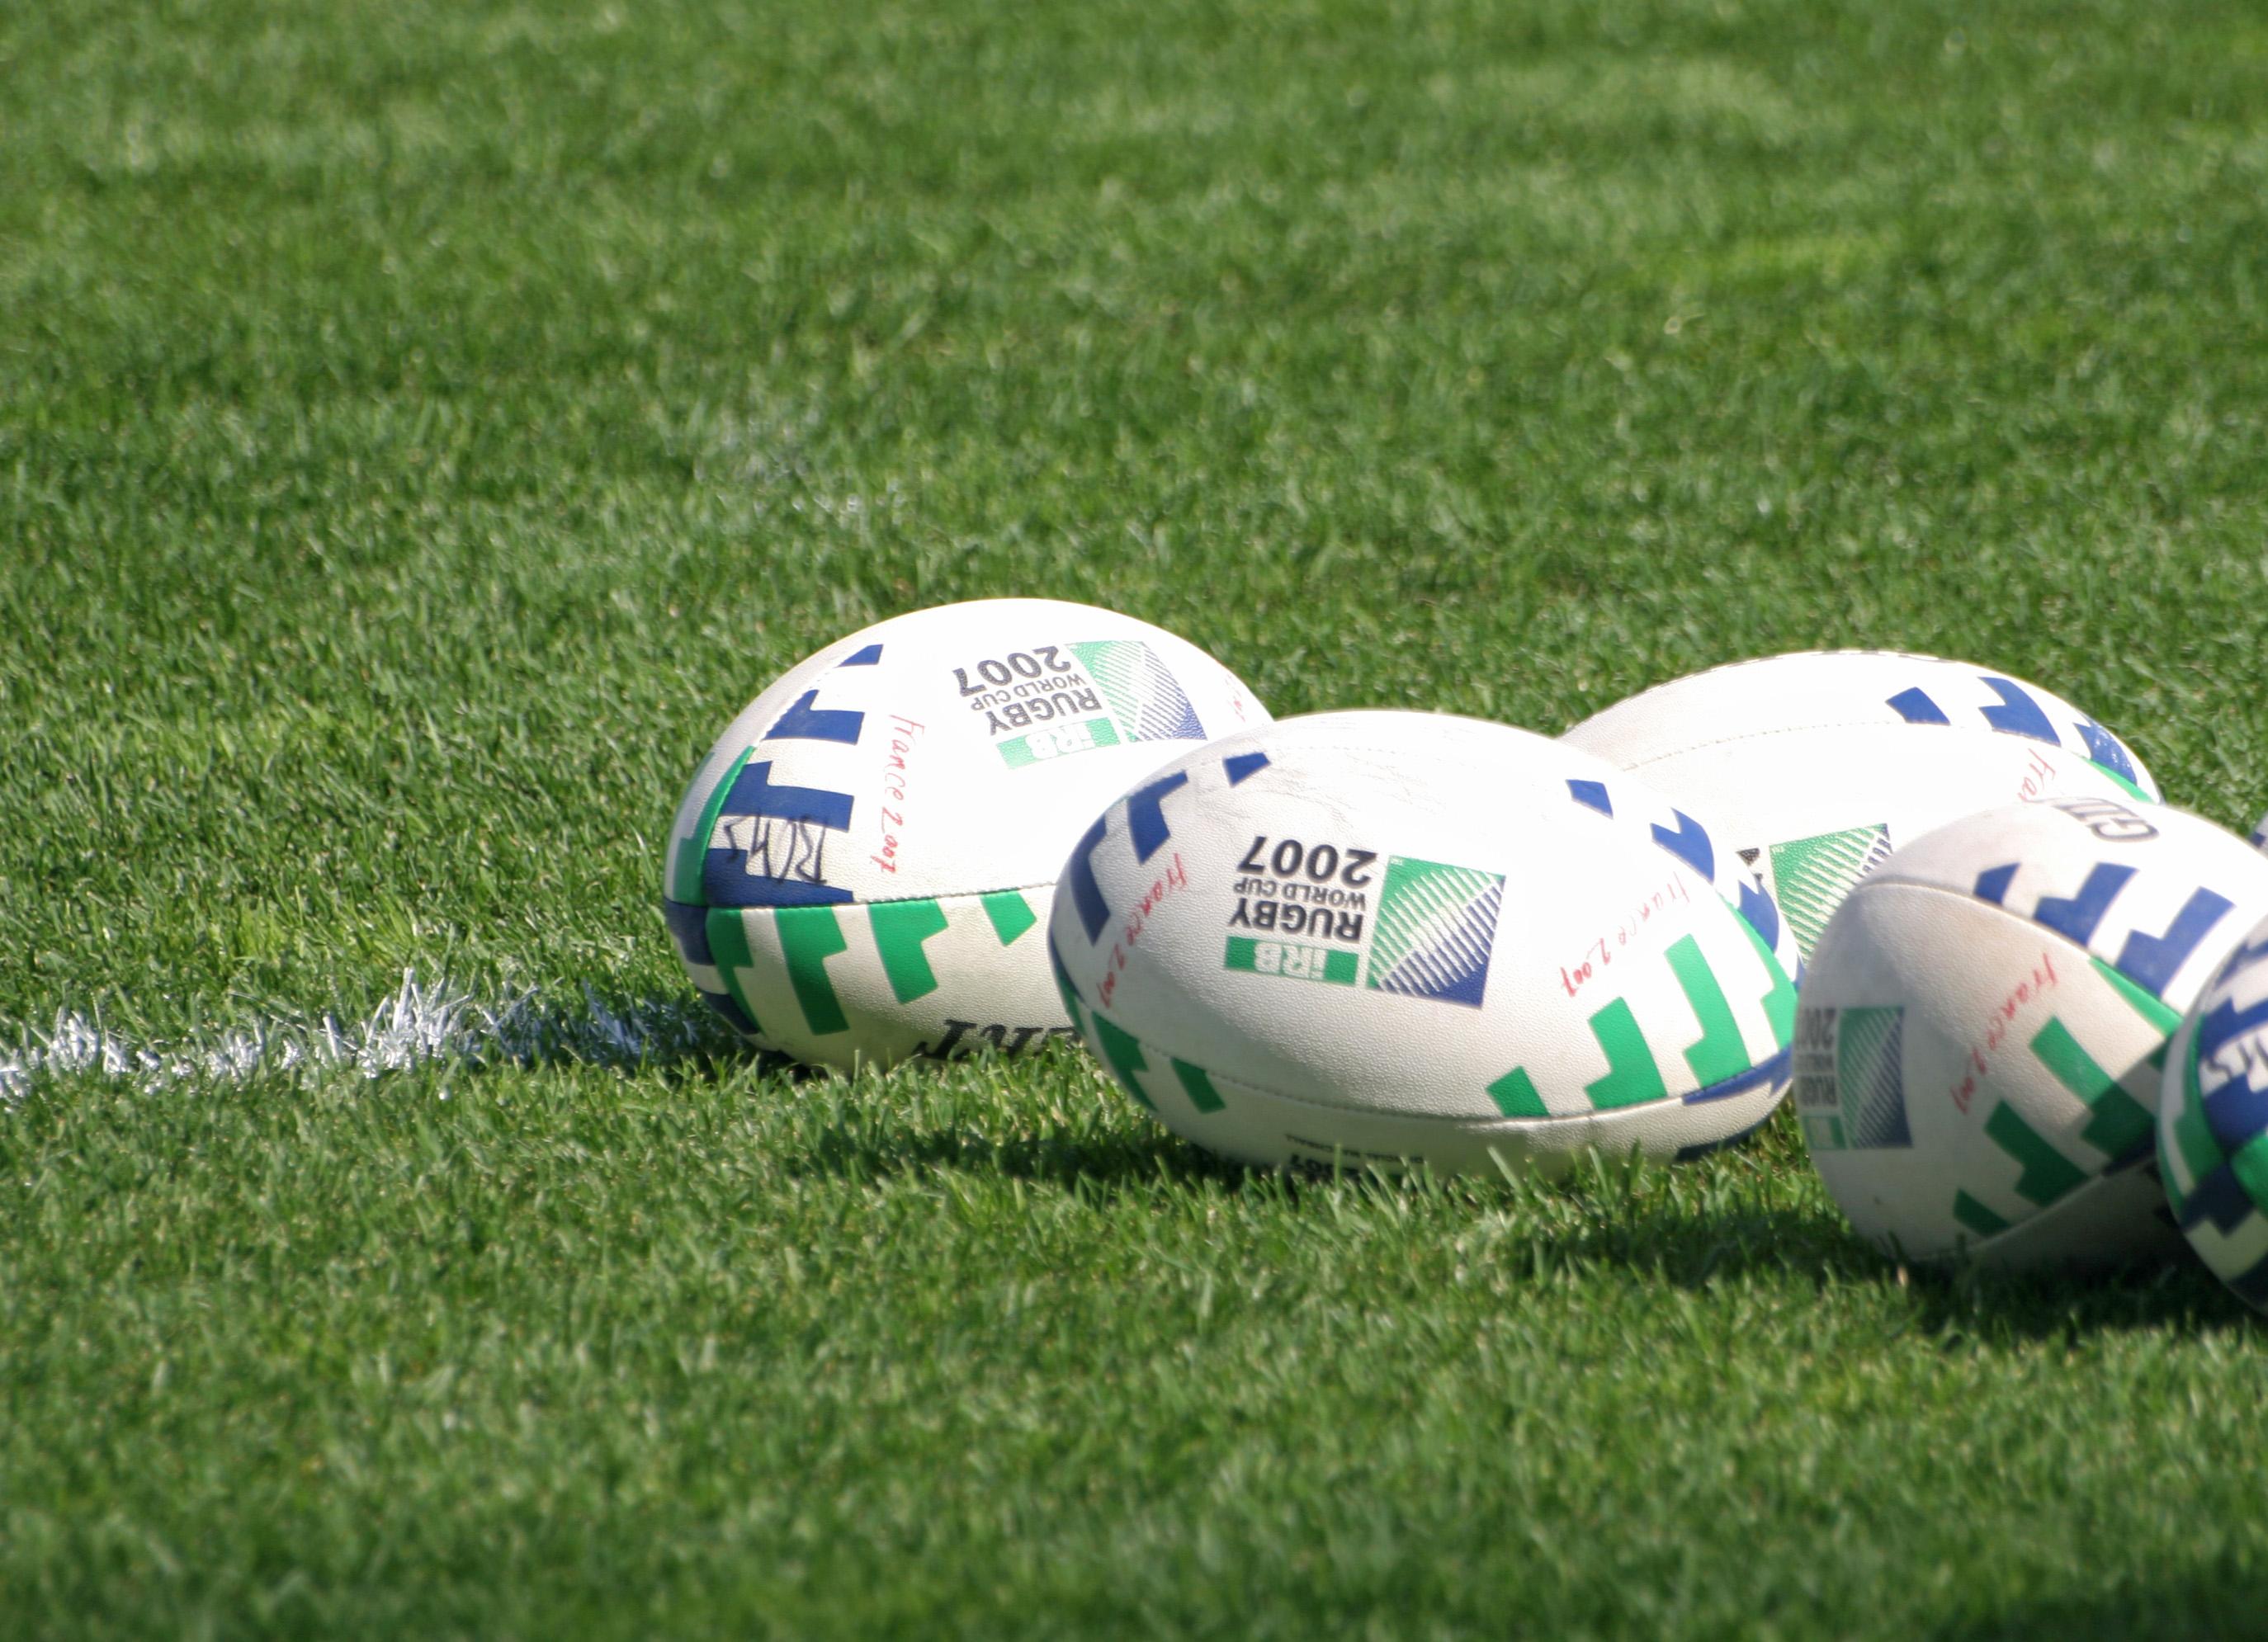 Ragbi lopta na travi